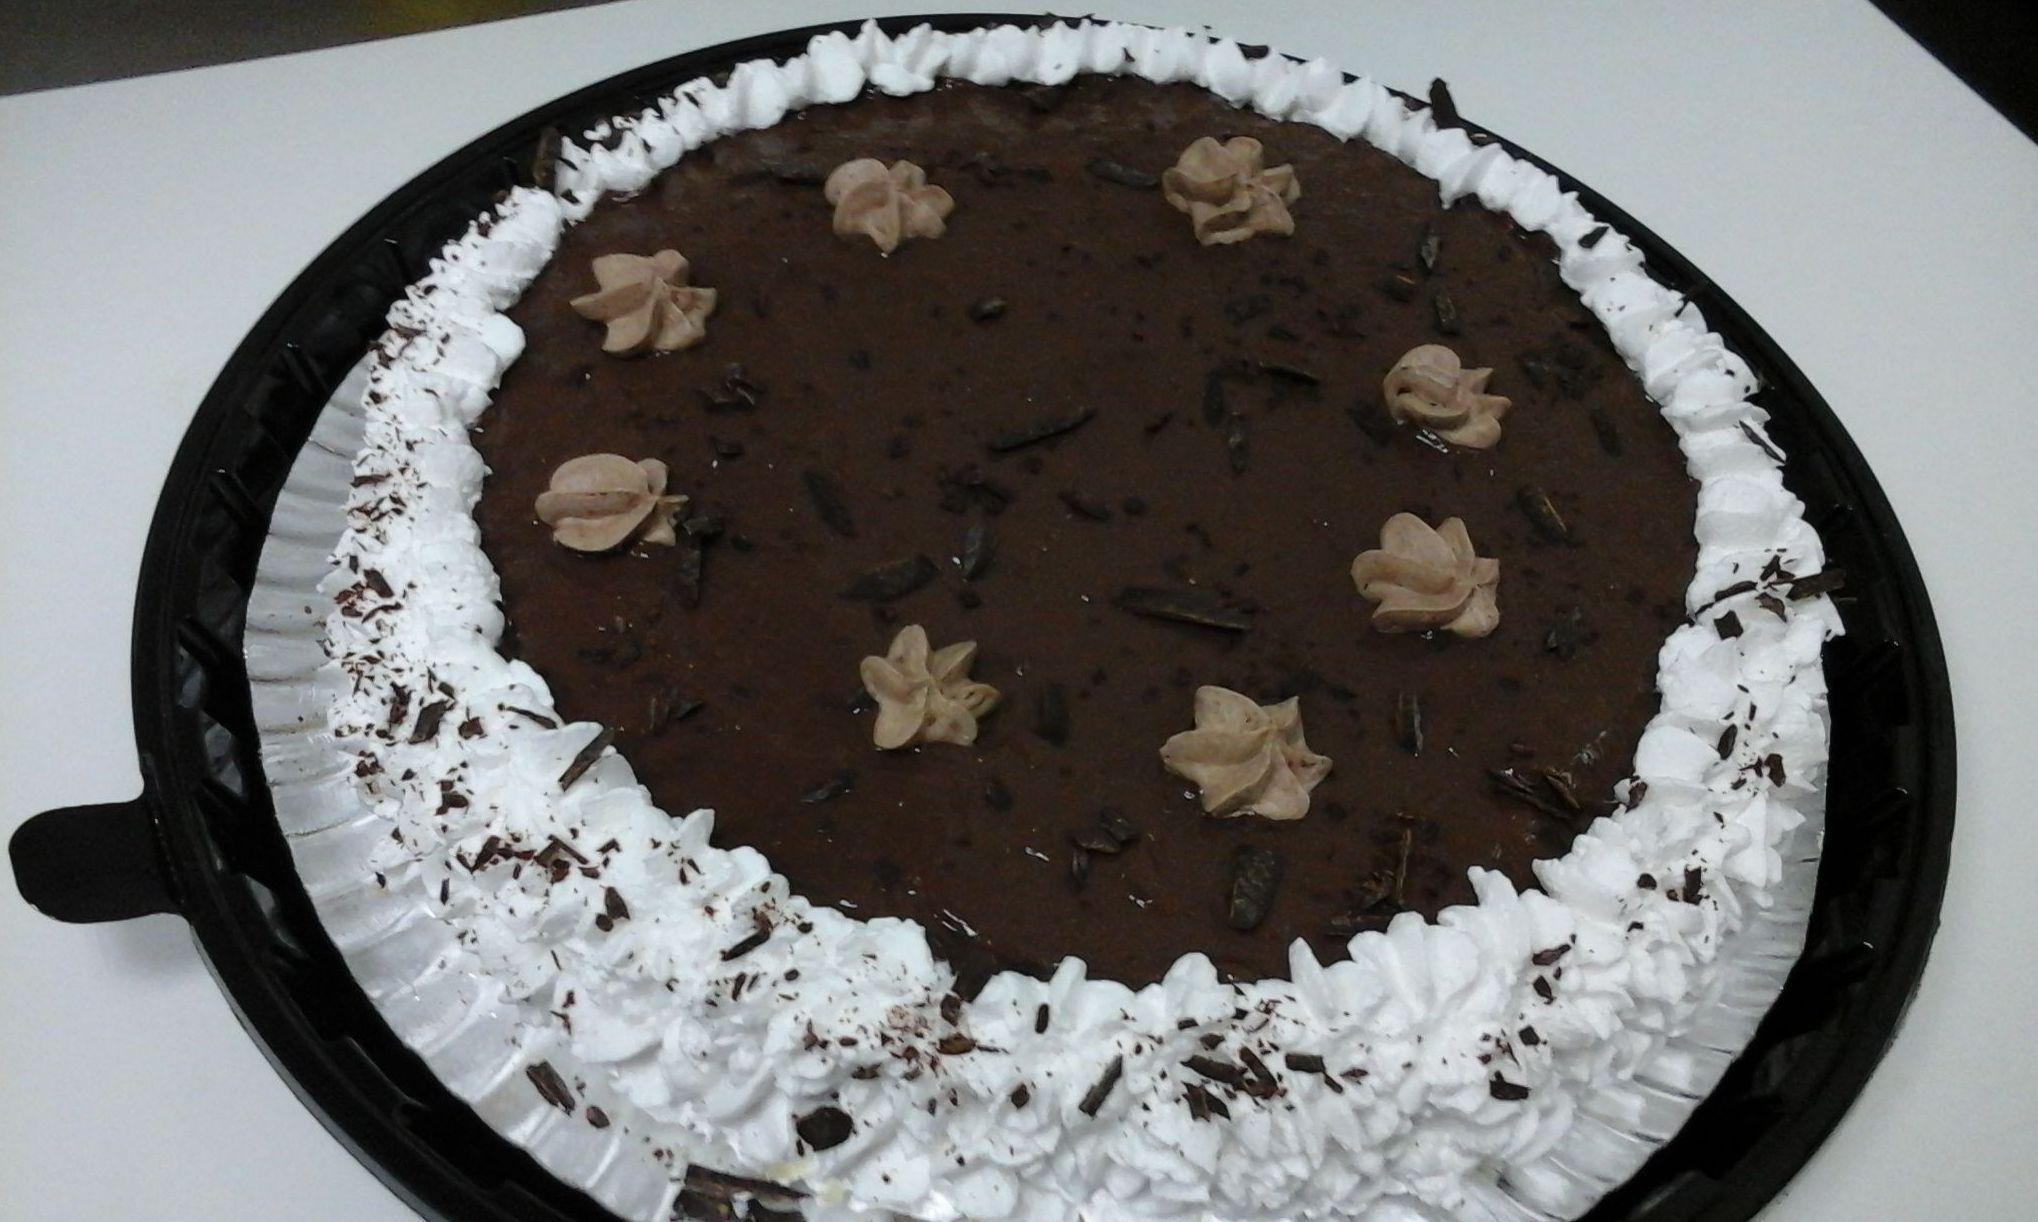 Tarta de chocolate y nata sin gluten